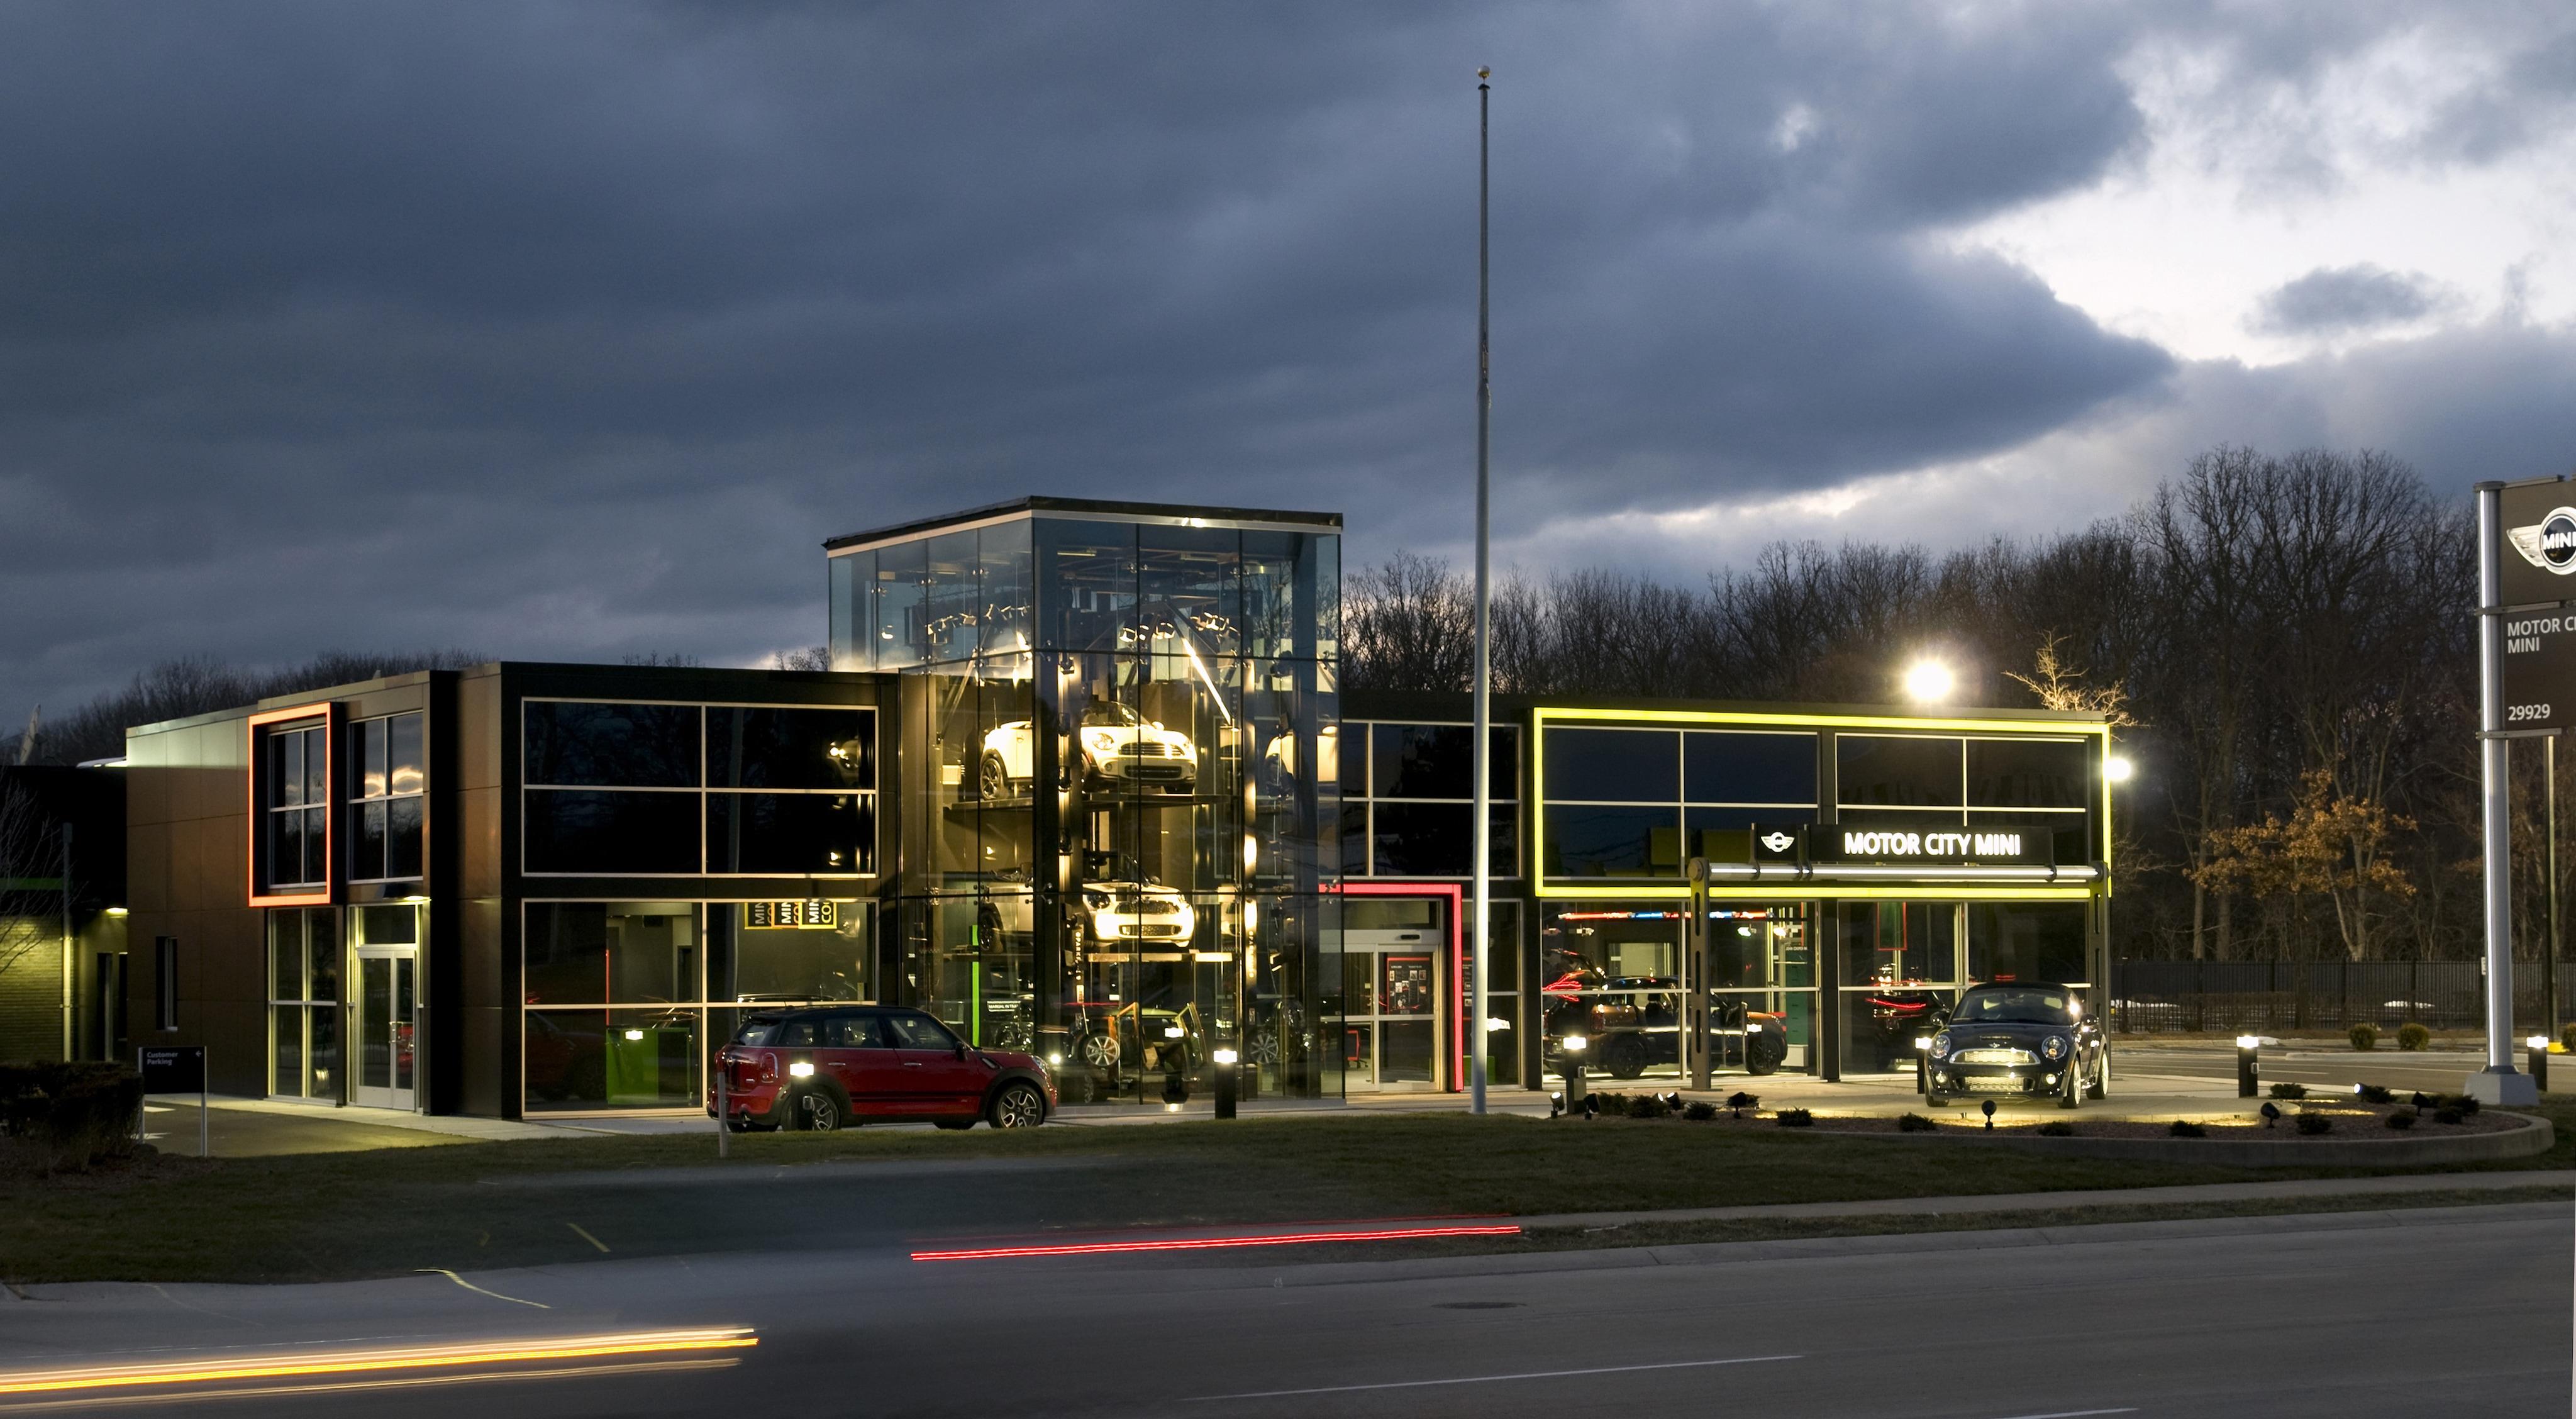 Motor city mini new mini dealership in southfield mi 48034 for Motor city car dealership